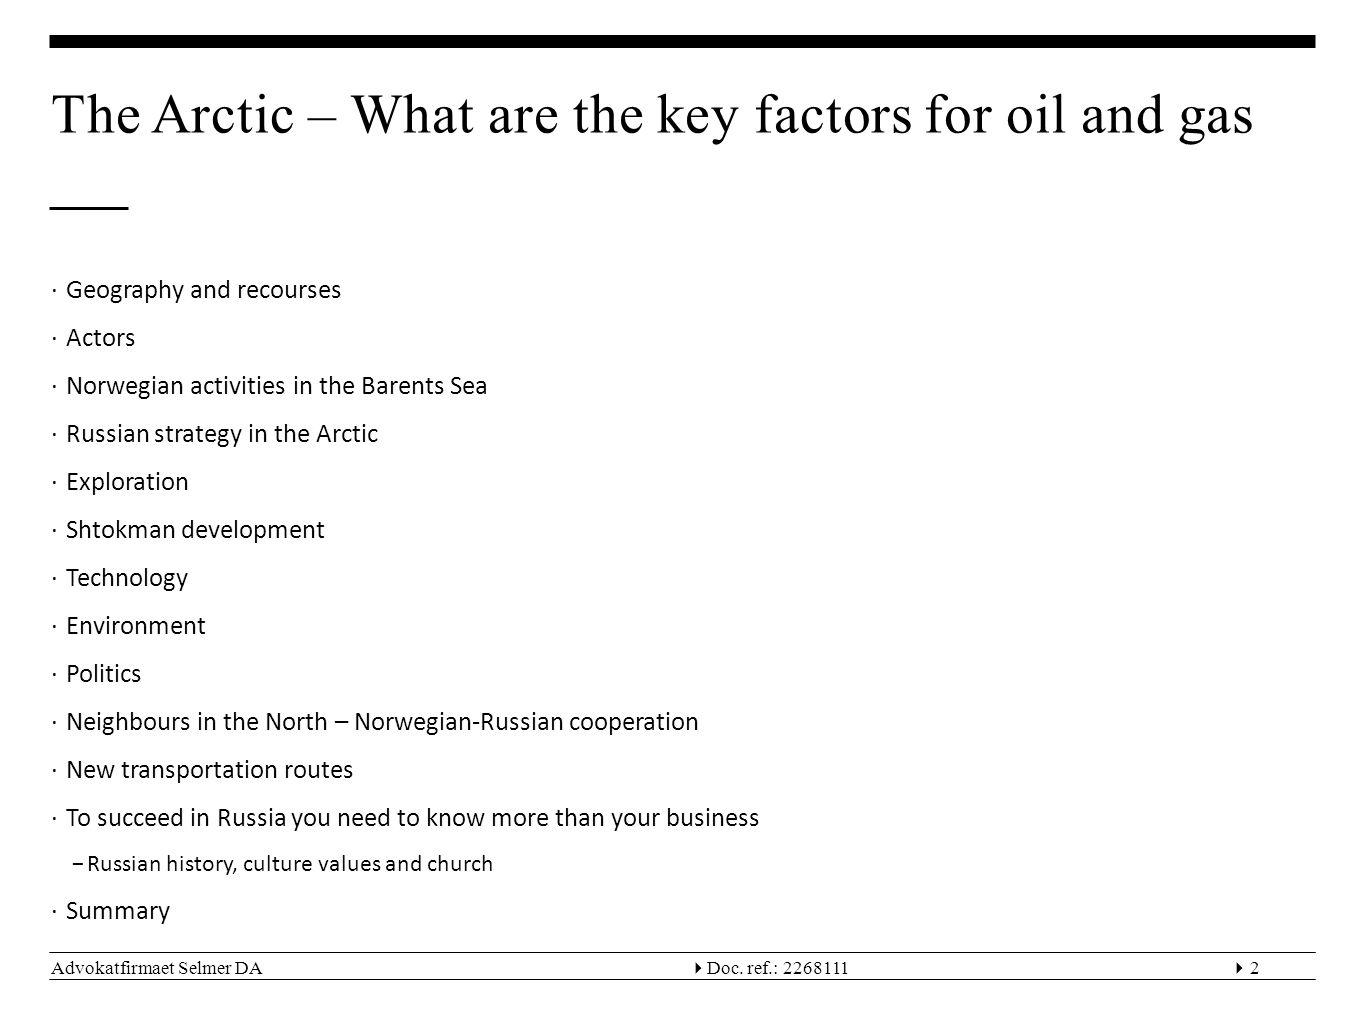 Advokatfirmaet Selmer DA  Doc. ref.: 22681113 Source: Norwegian Ministry of Petroleum and Energy